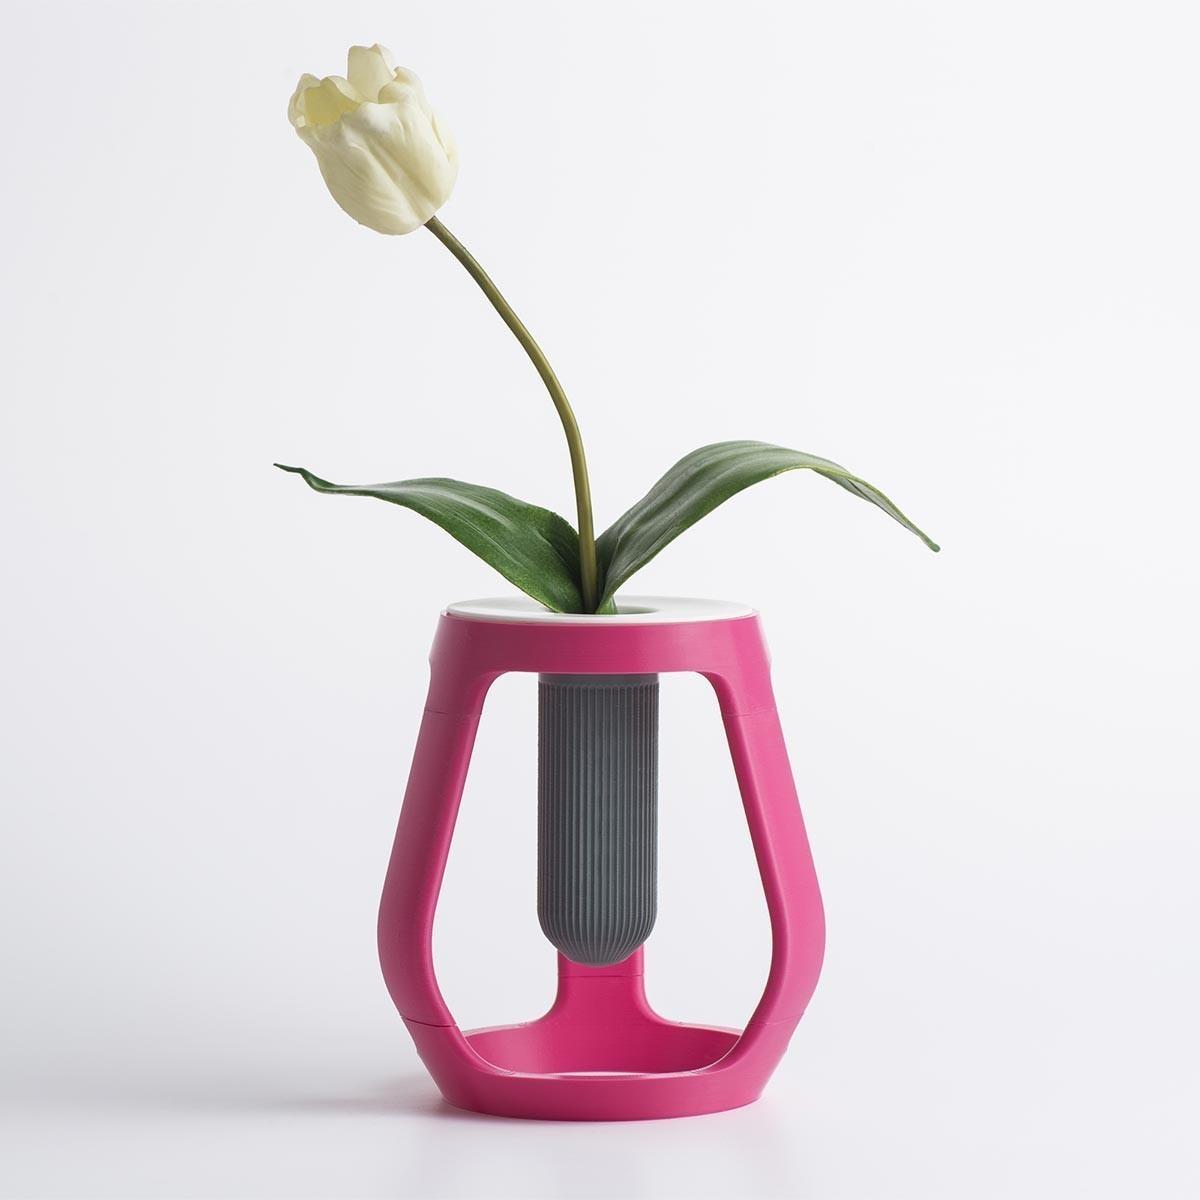 gravity_01.jpg Download free STL file Gravity - Flower vase • 3D printing object, EUMAKERS